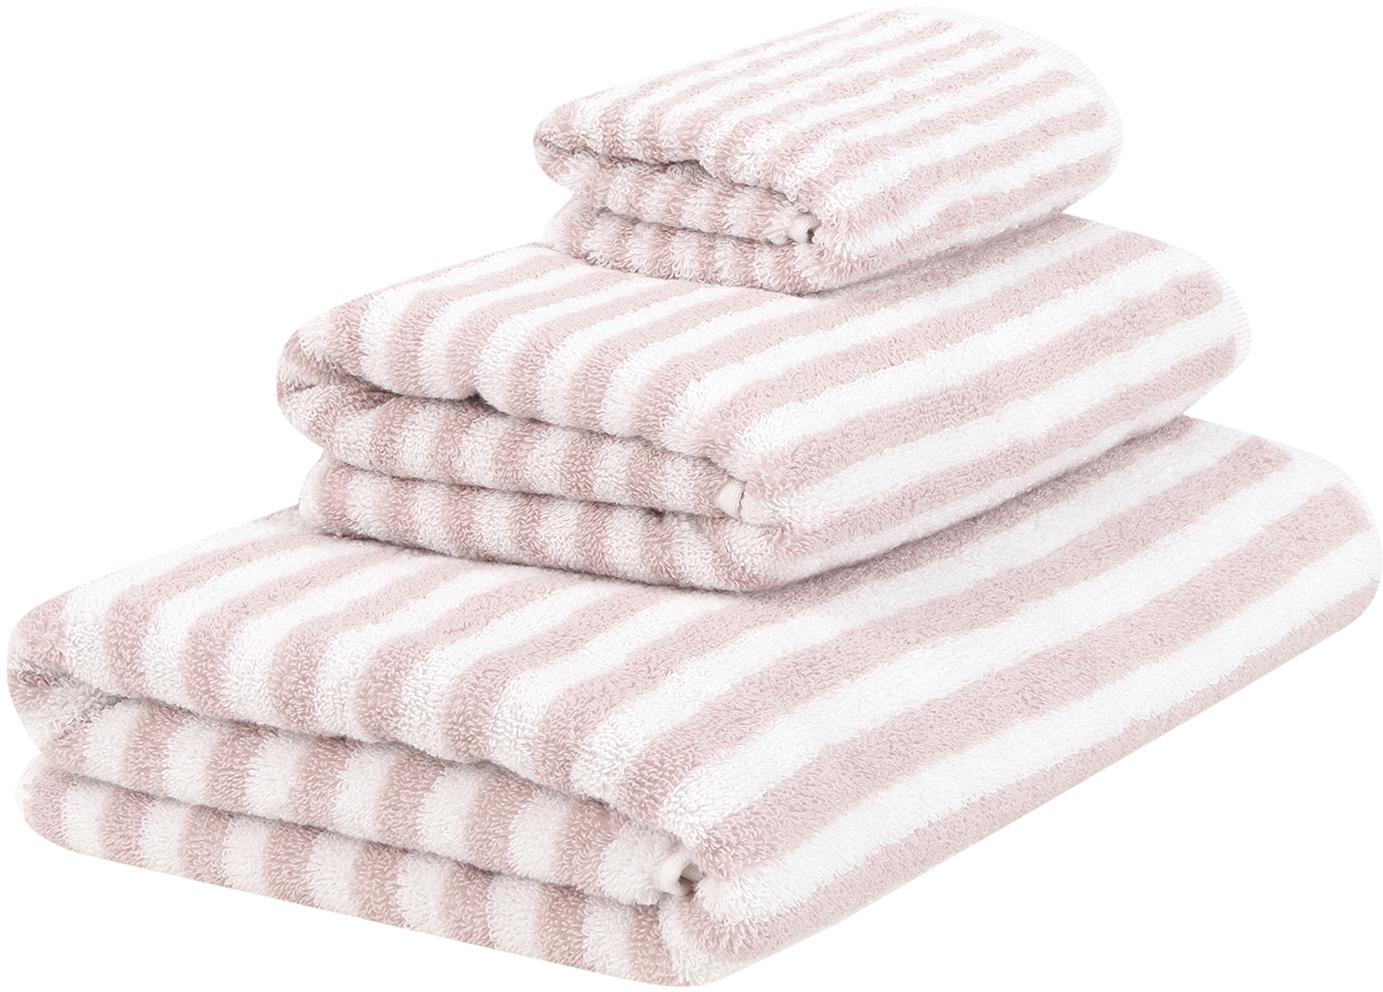 Set 3 asciugamani reversibili Viola, Rosa, bianco crema, Set in varie misure